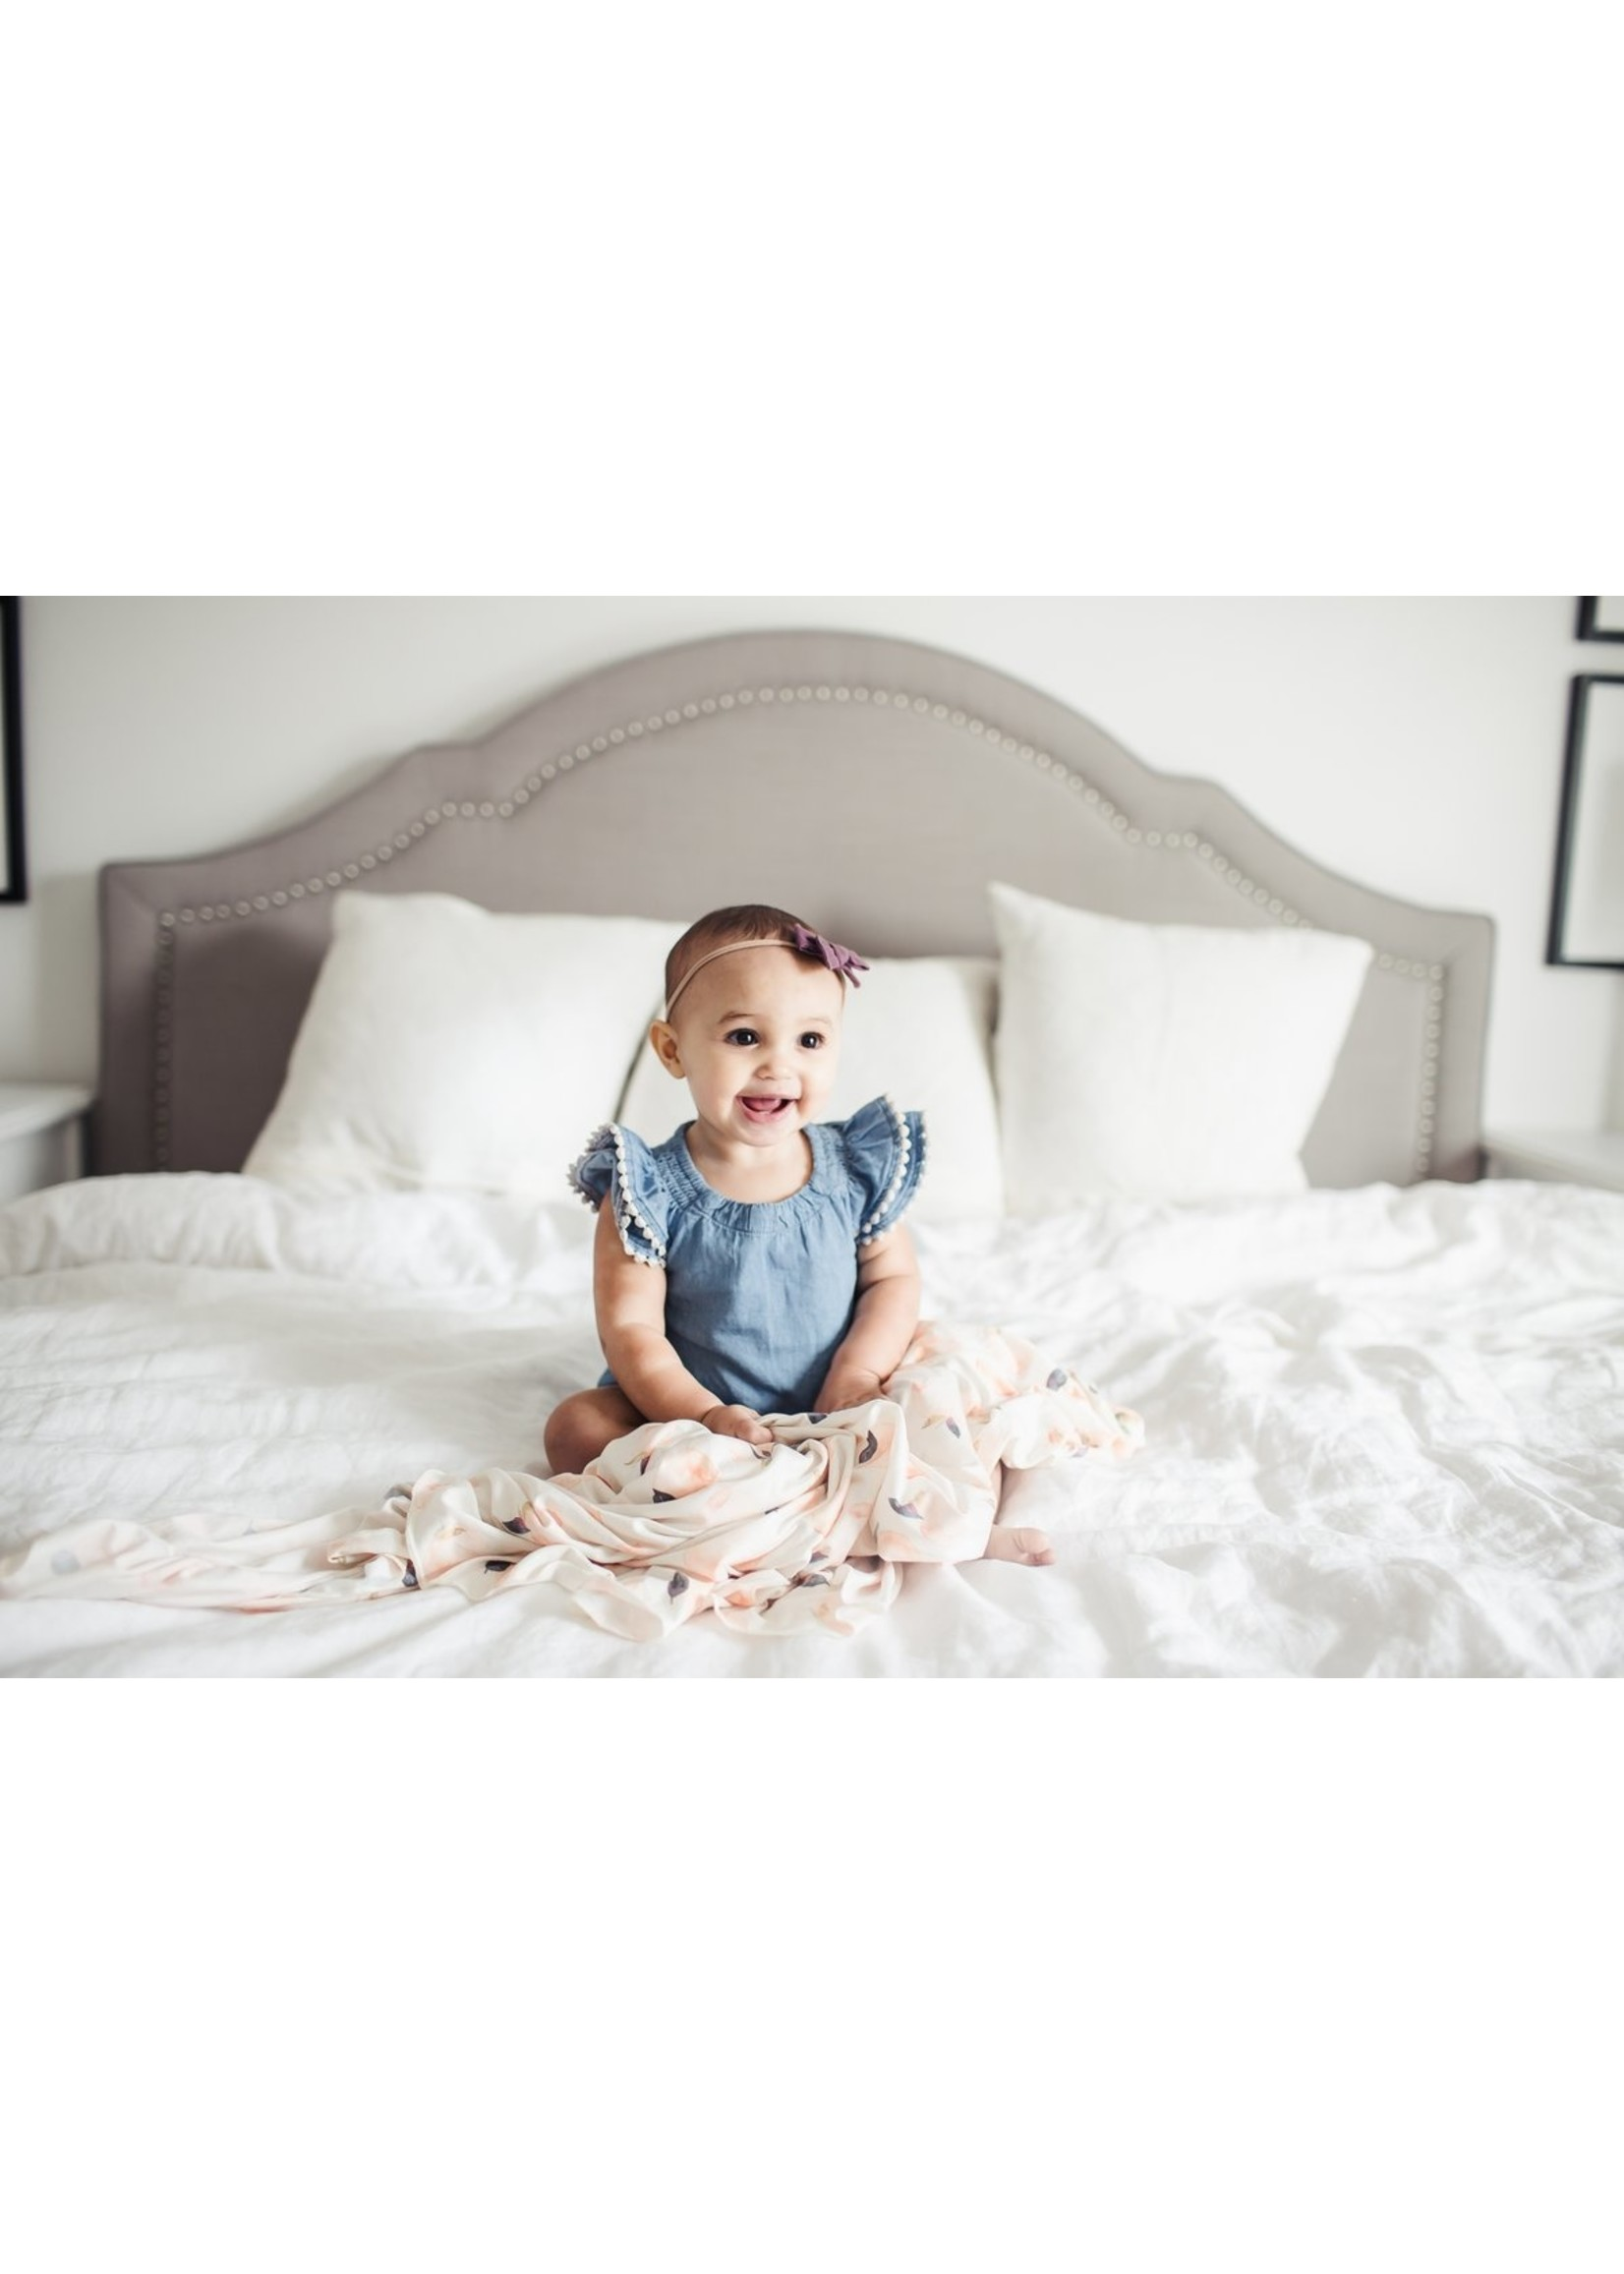 Copper pearl Swaddle Blanket - Caroline